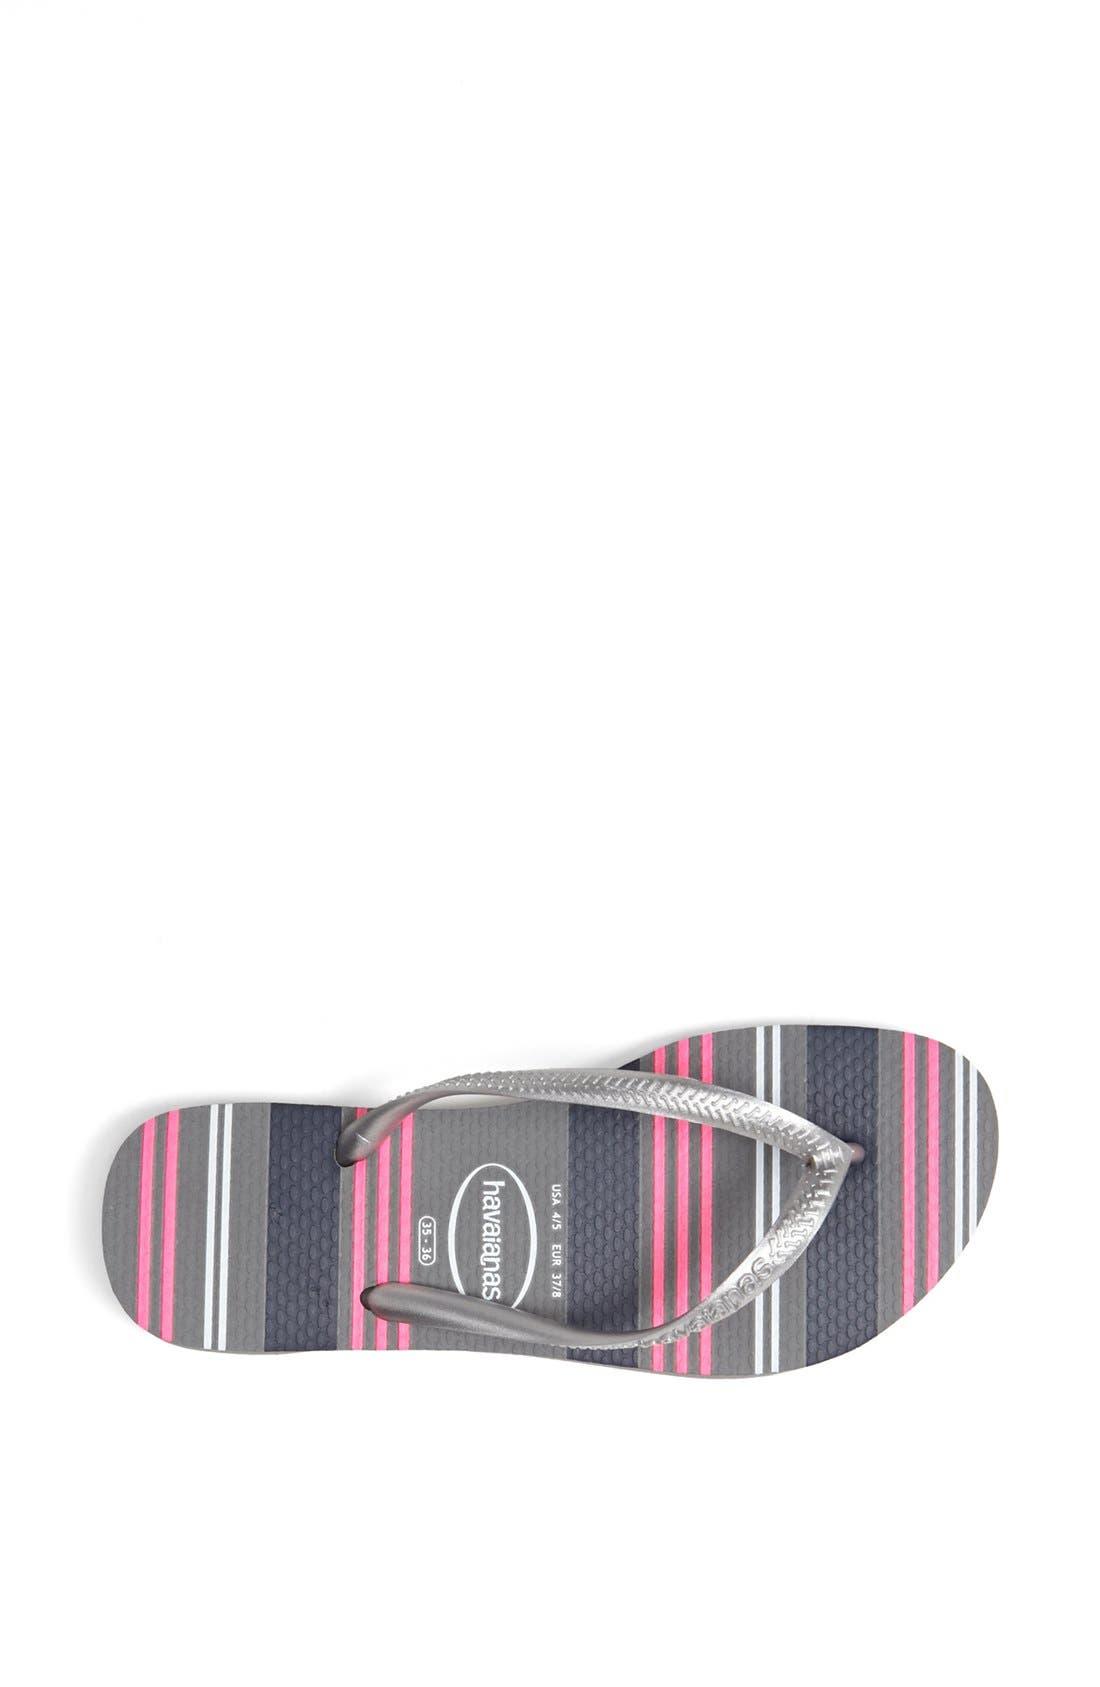 Alternate Image 3  - Havaianas 'Slim - Neon Stripes' Sandal